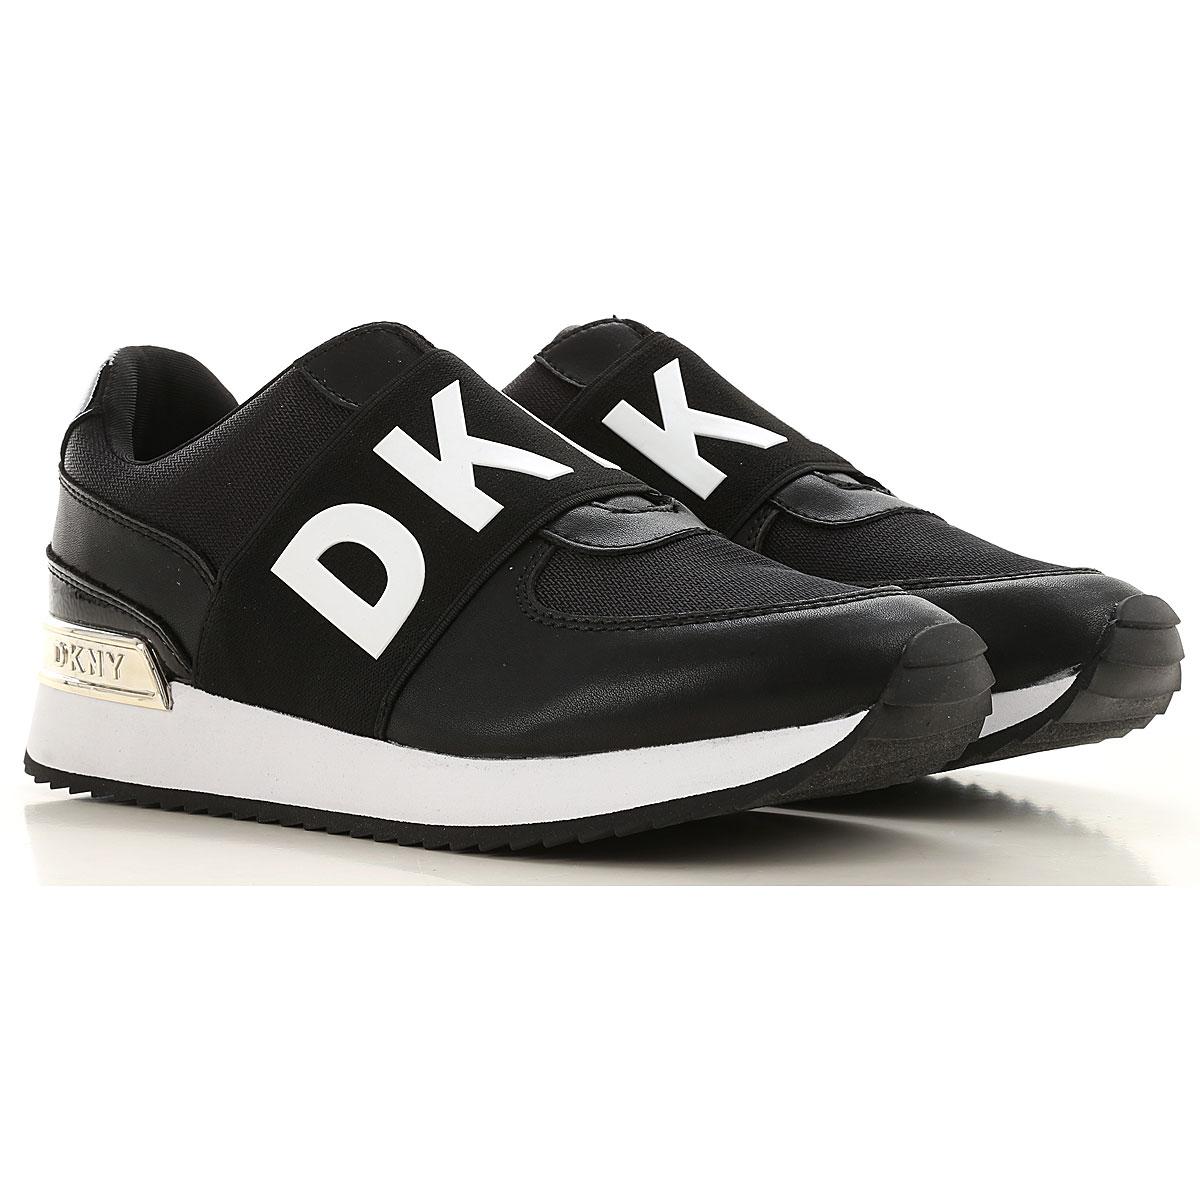 DKNY Sneaker Femme, Noir, Cuir, 2019, 38 40